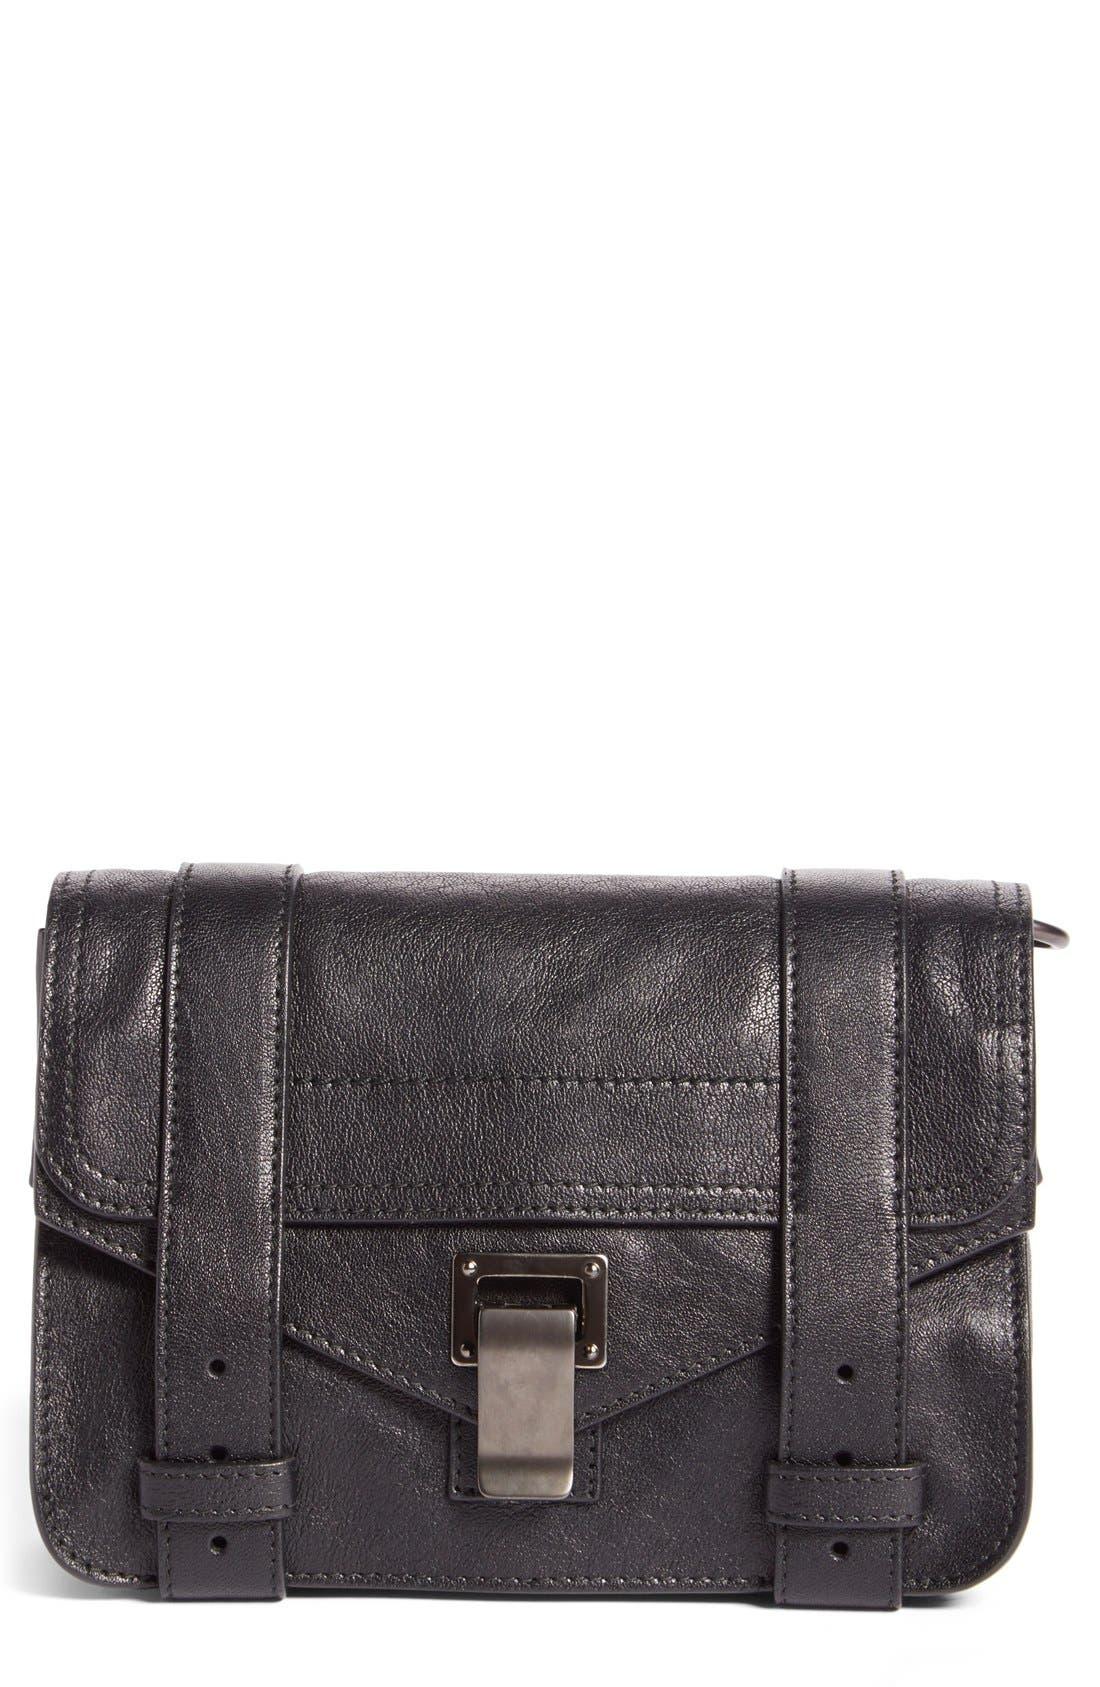 Proenza Schouler 'Mini PS1' Lambskin Leather Crossbody Bag